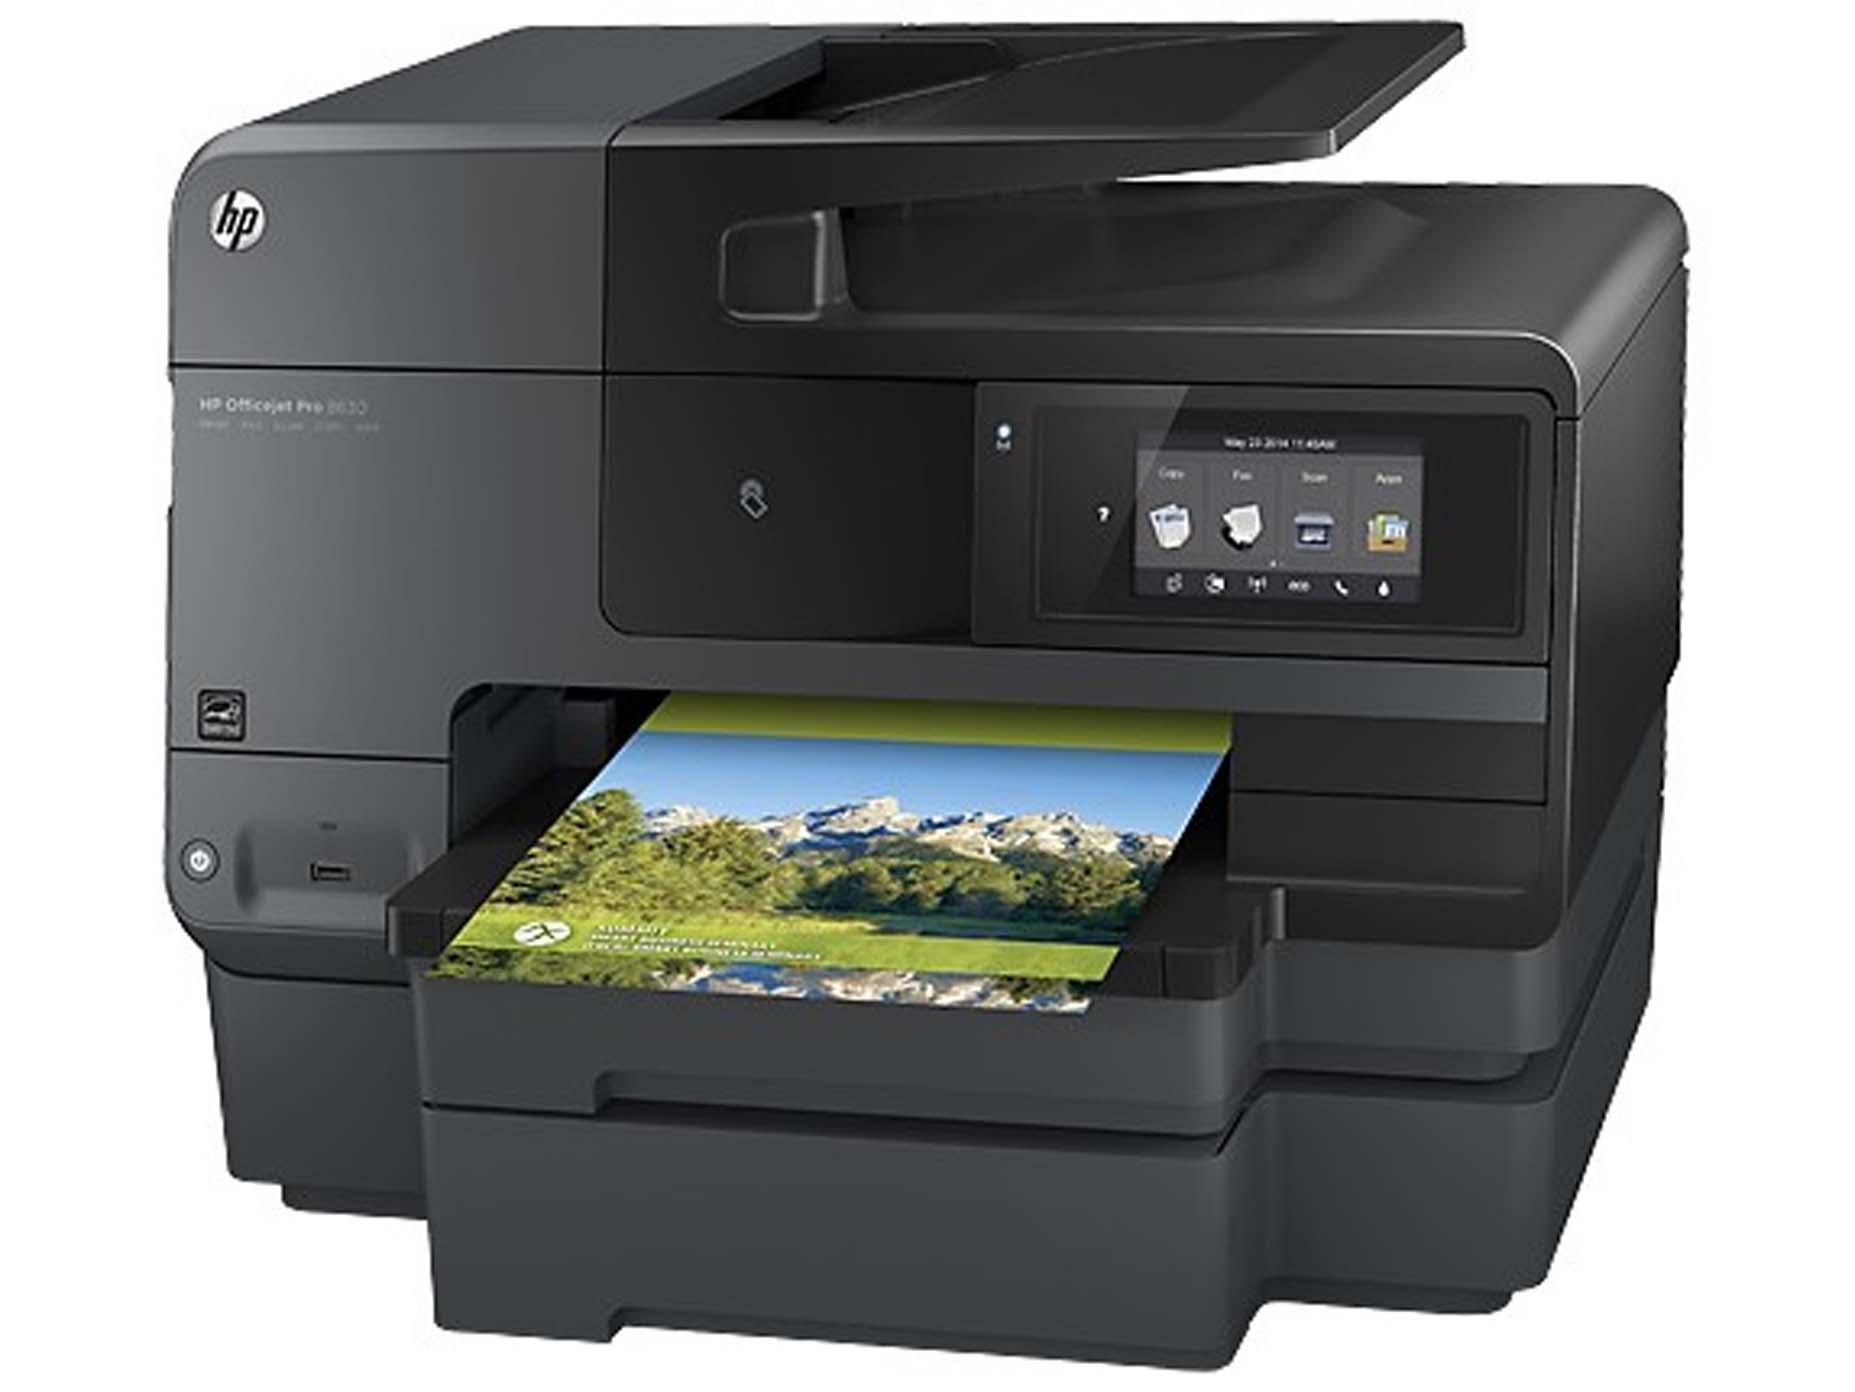 Fuji Xerox Docuprint M115z Putih Daftar Harga Terkini Dan Fujixerox Dpm115z Spesifikasi Hp Officejet Pro 8630 E All In One Printer